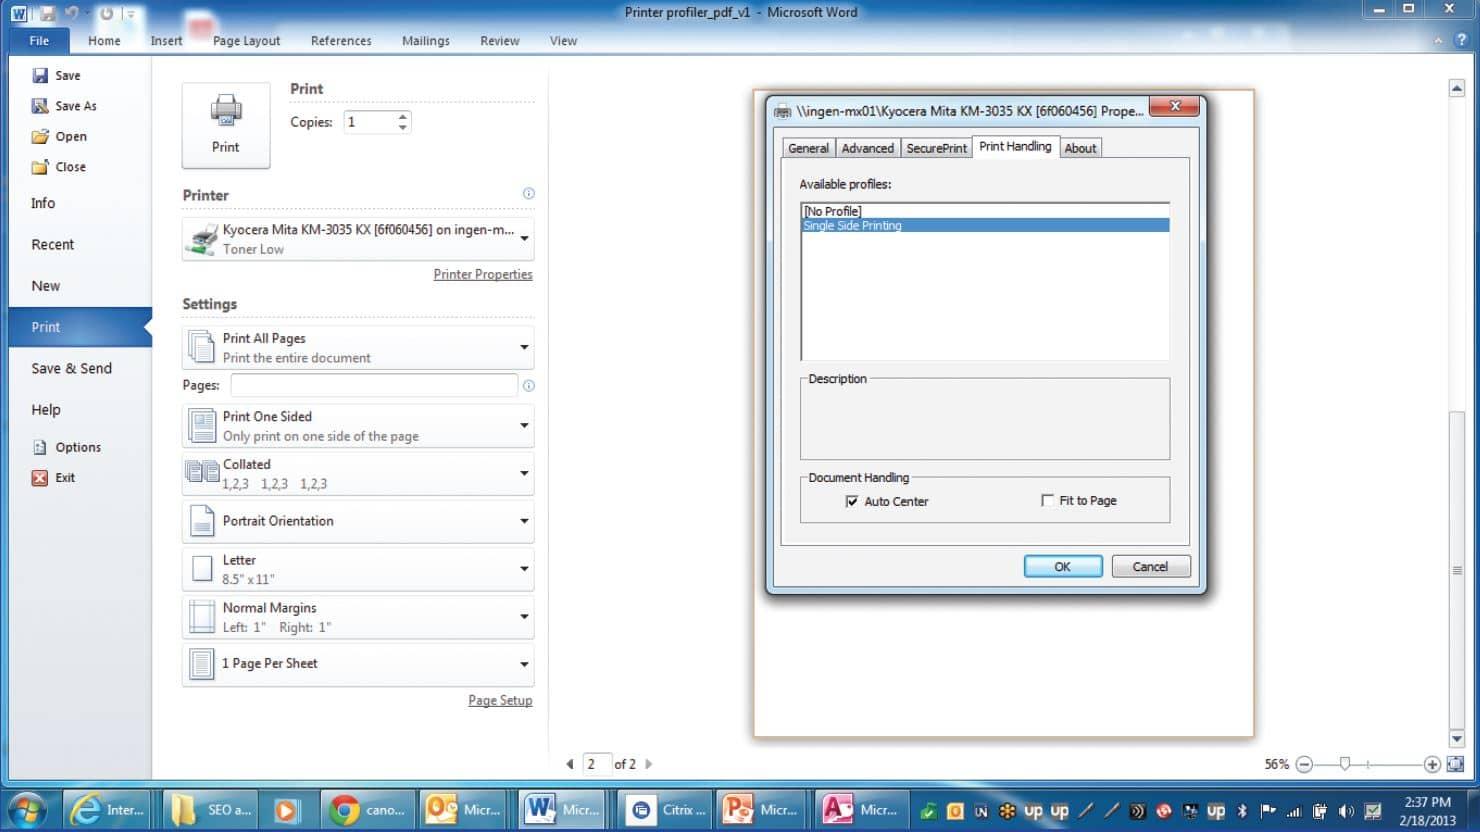 uniprint infinity setting customer printer profiles